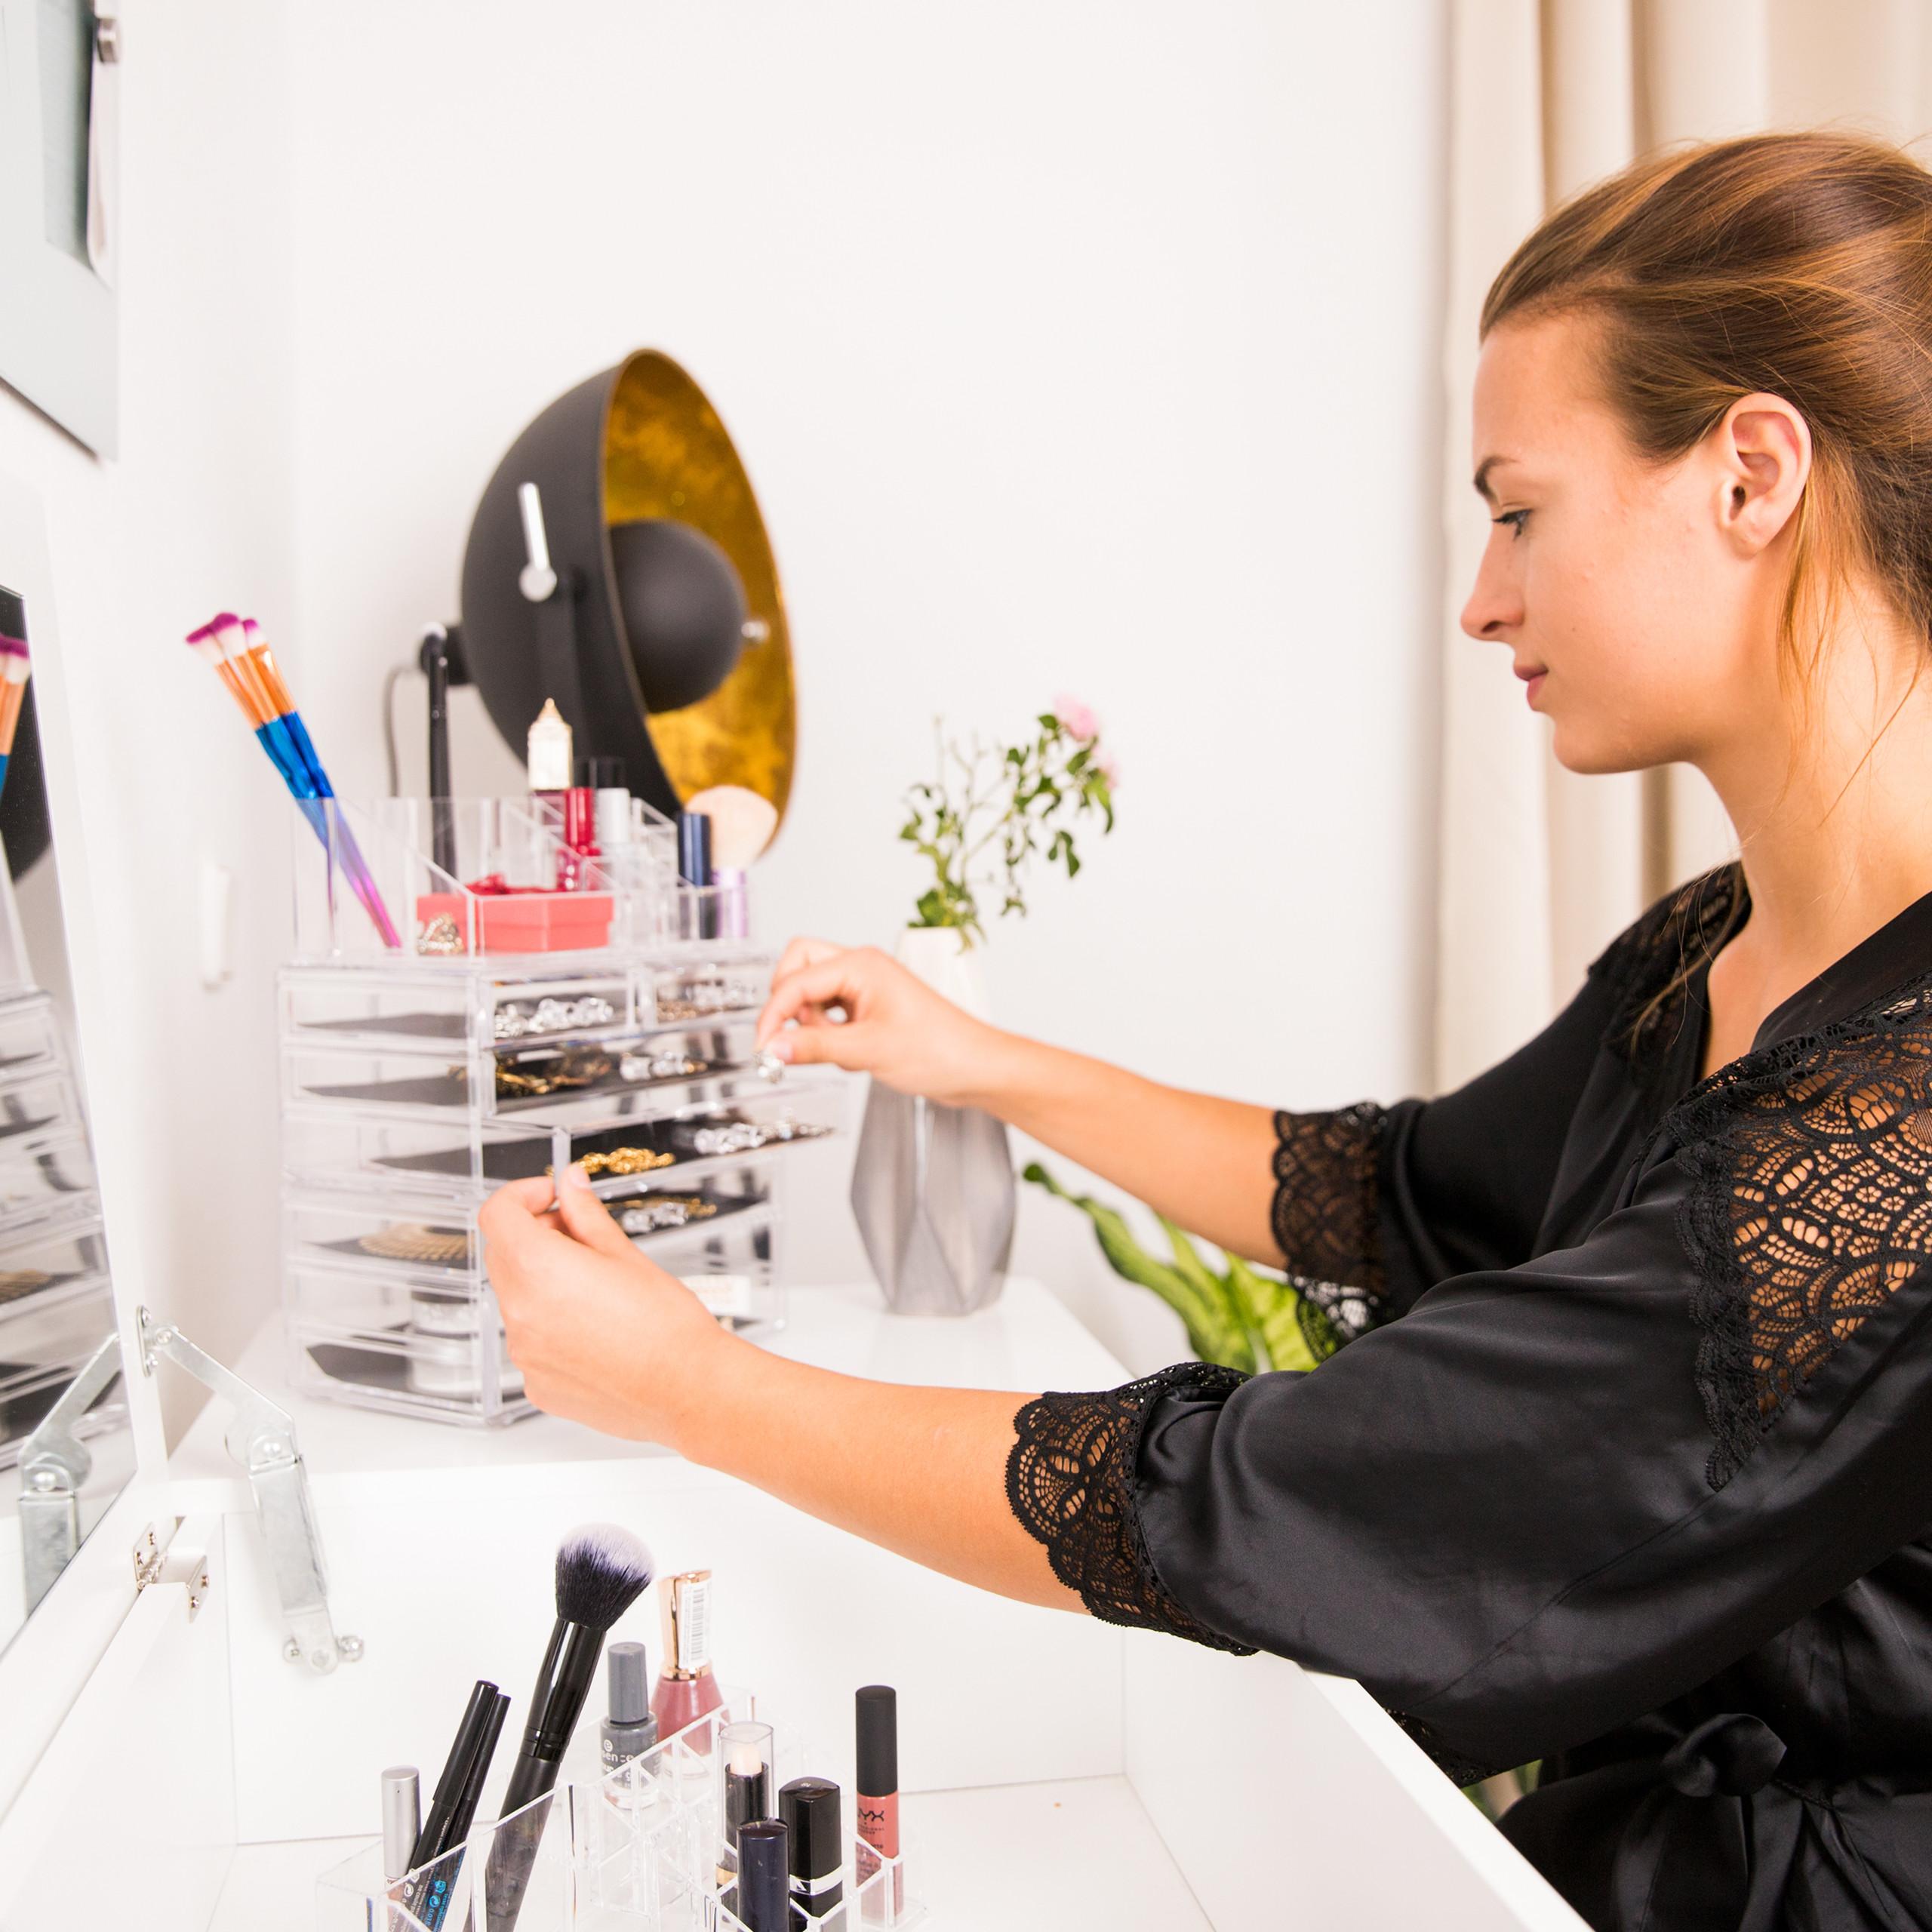 make-up-organizer-opbergen-van-cosmetica-acryl-stapelbaar-met-lades miniatuur 34